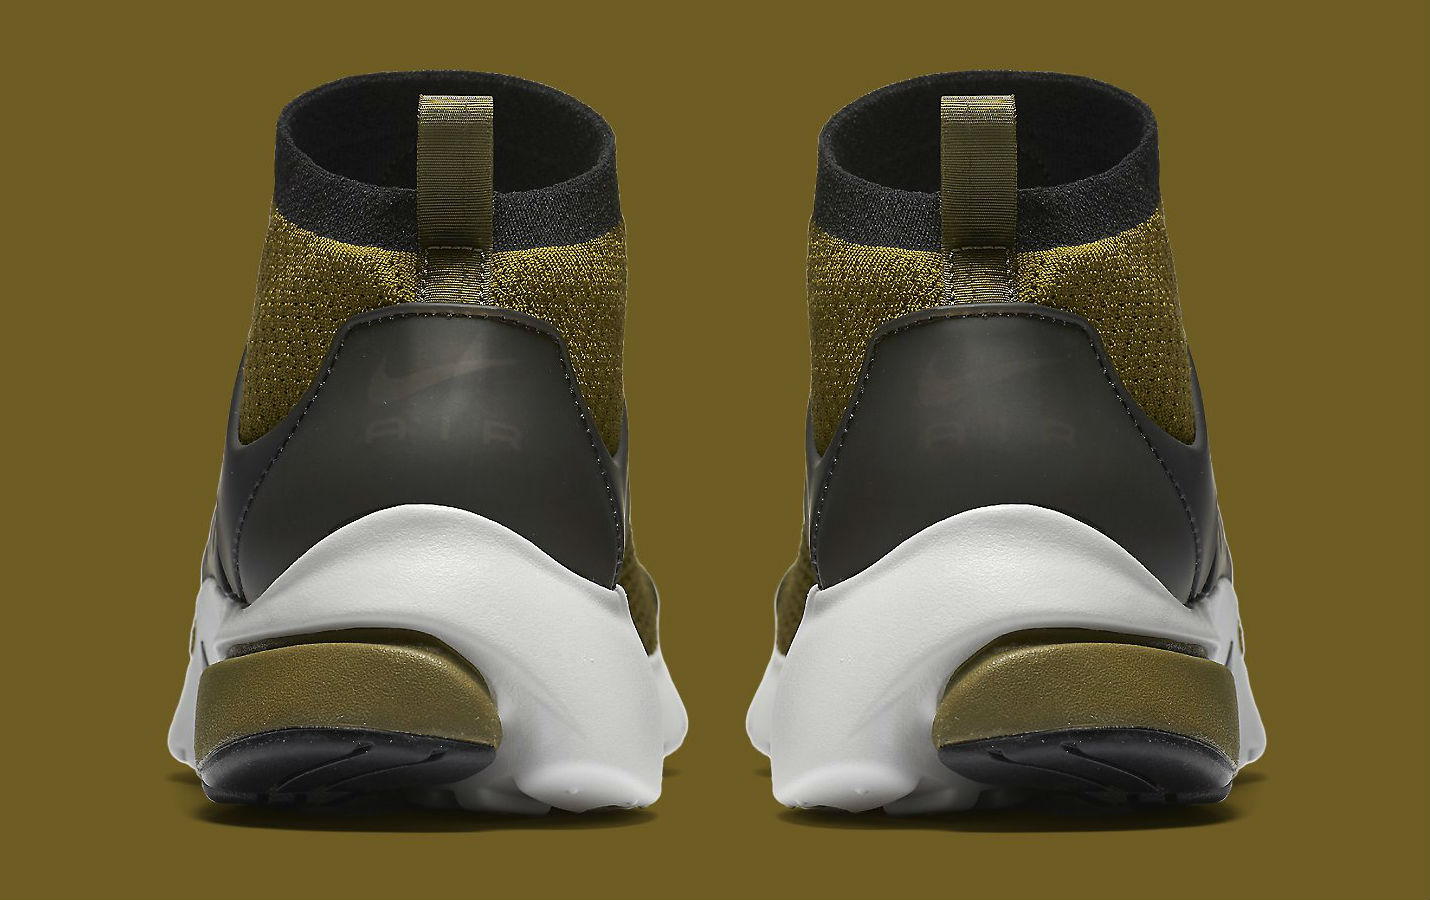 Nike Air Presto Ultra Flyknit Olive Flak Heel 835570-300